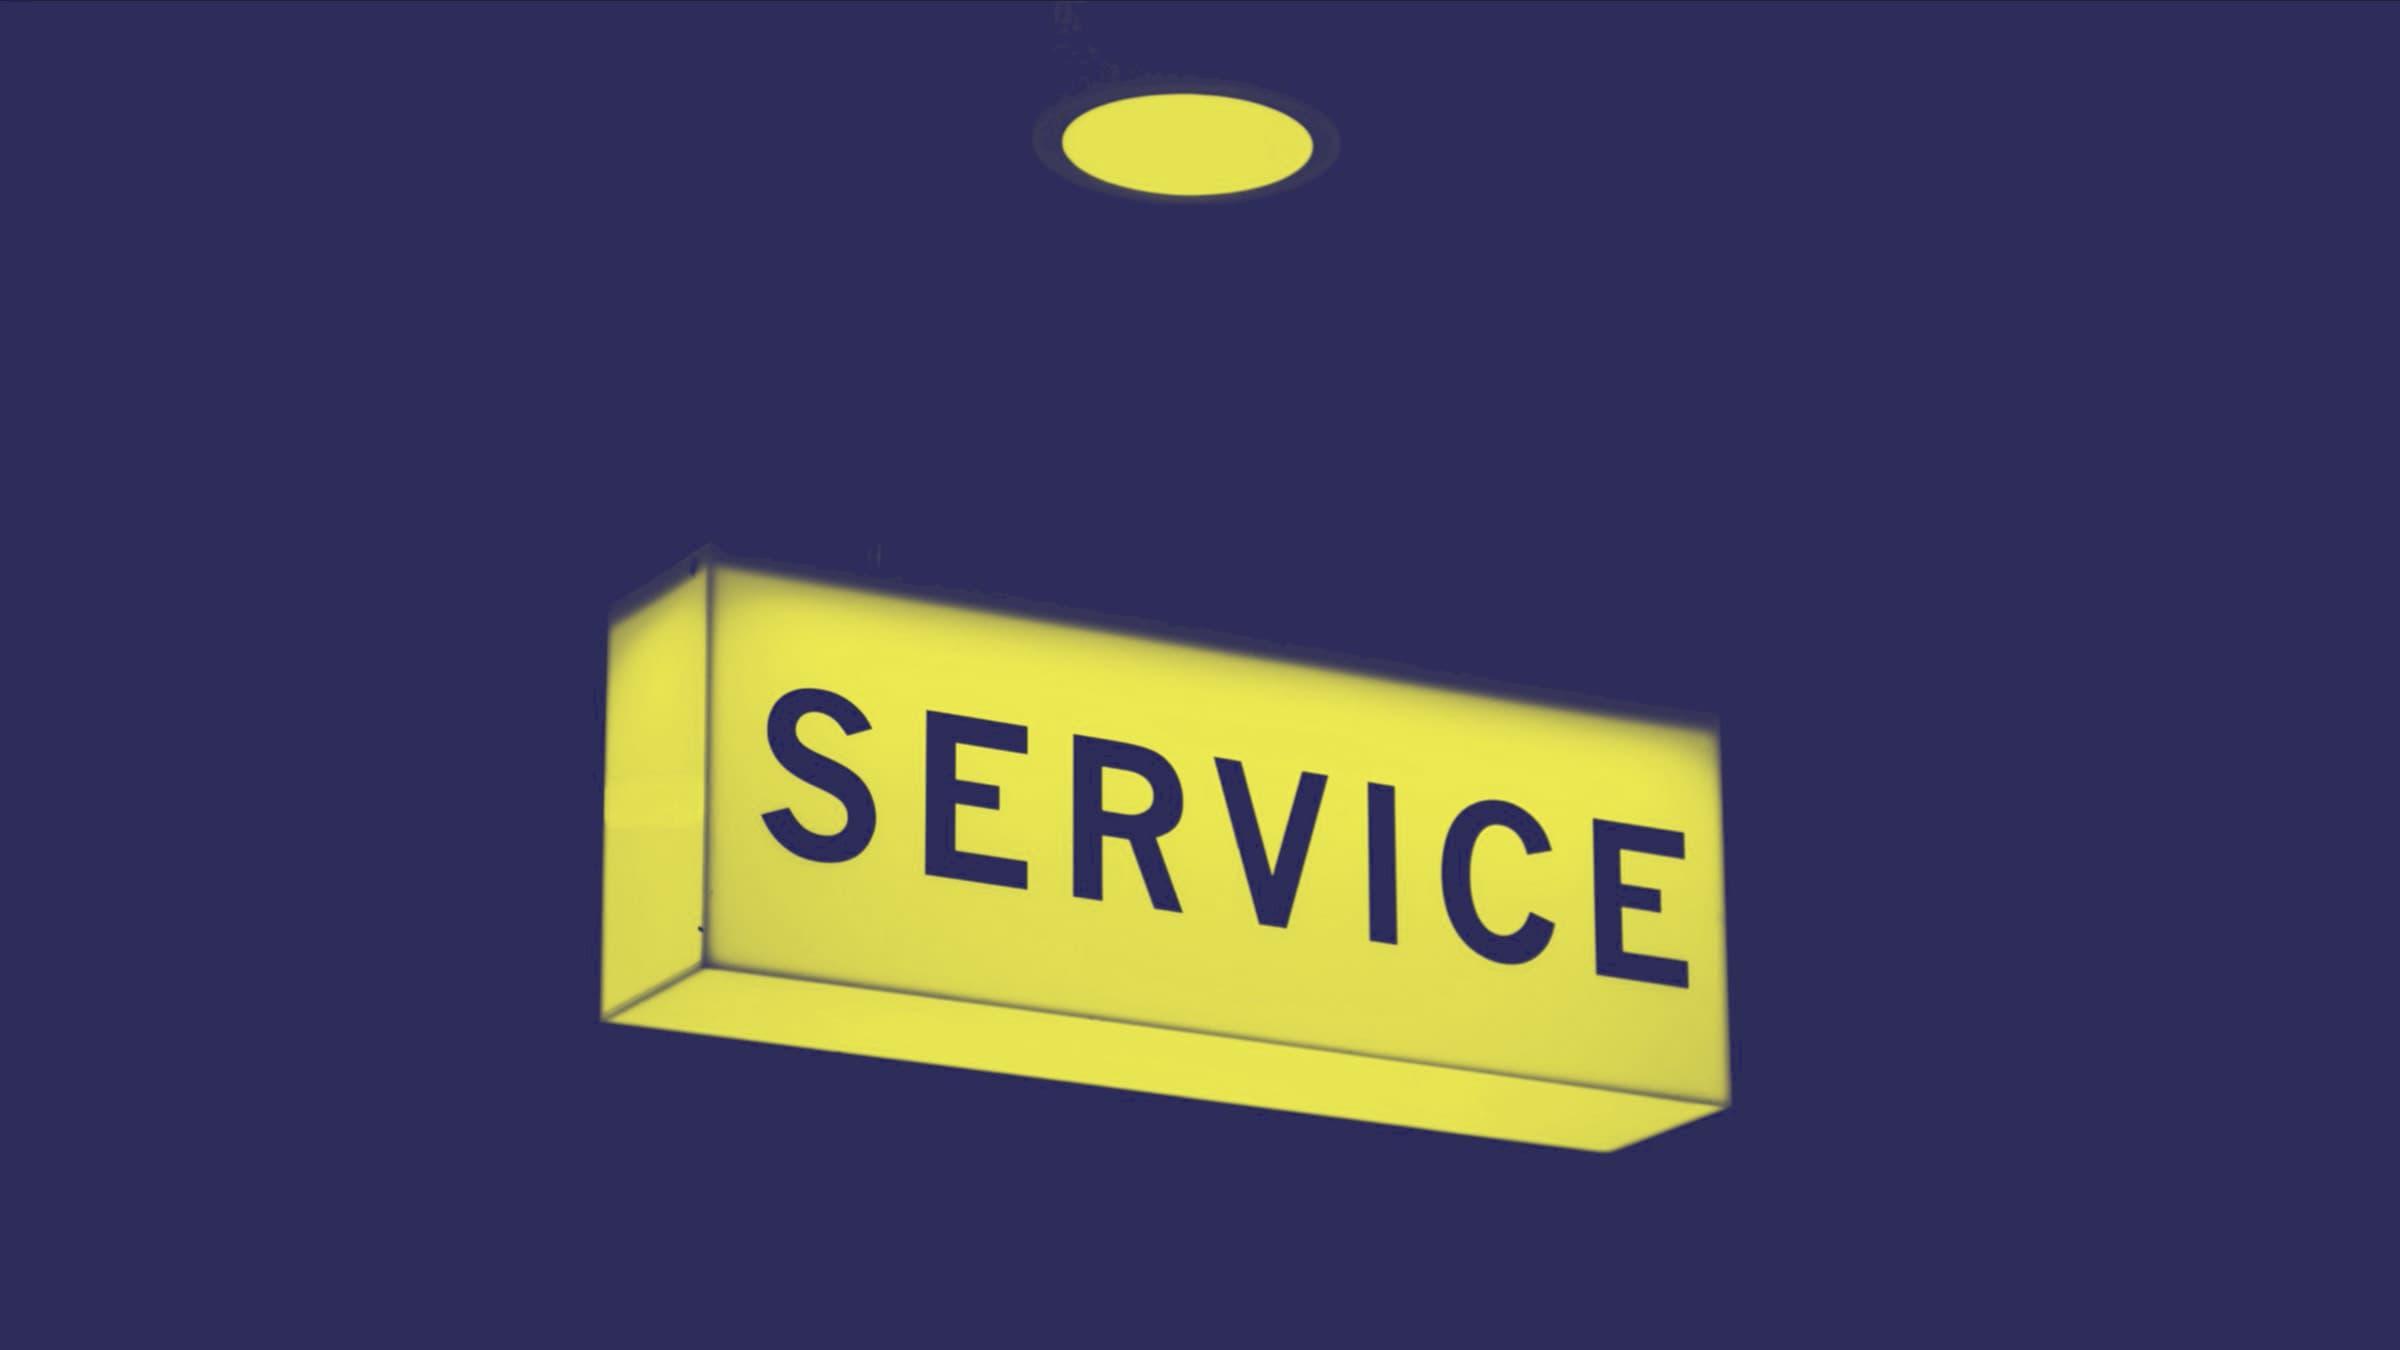 service light shining